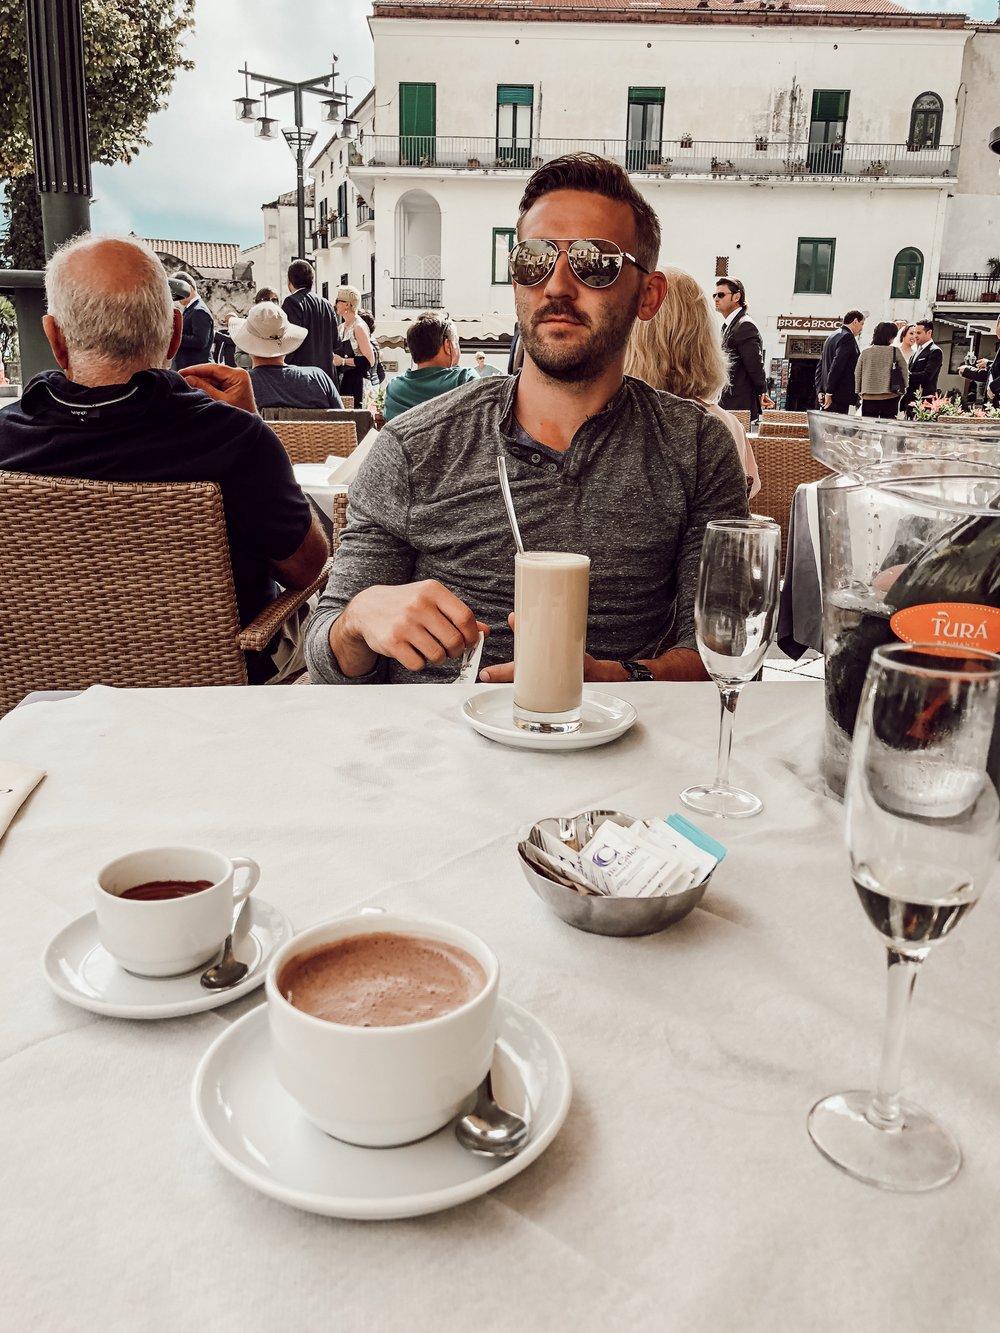 Cafe Ravello Italy | Three Days on the Amalfi Coast, Amalfi Travel Guide, What to Do in Amalfi Italy | Miranda Schroeder Blog